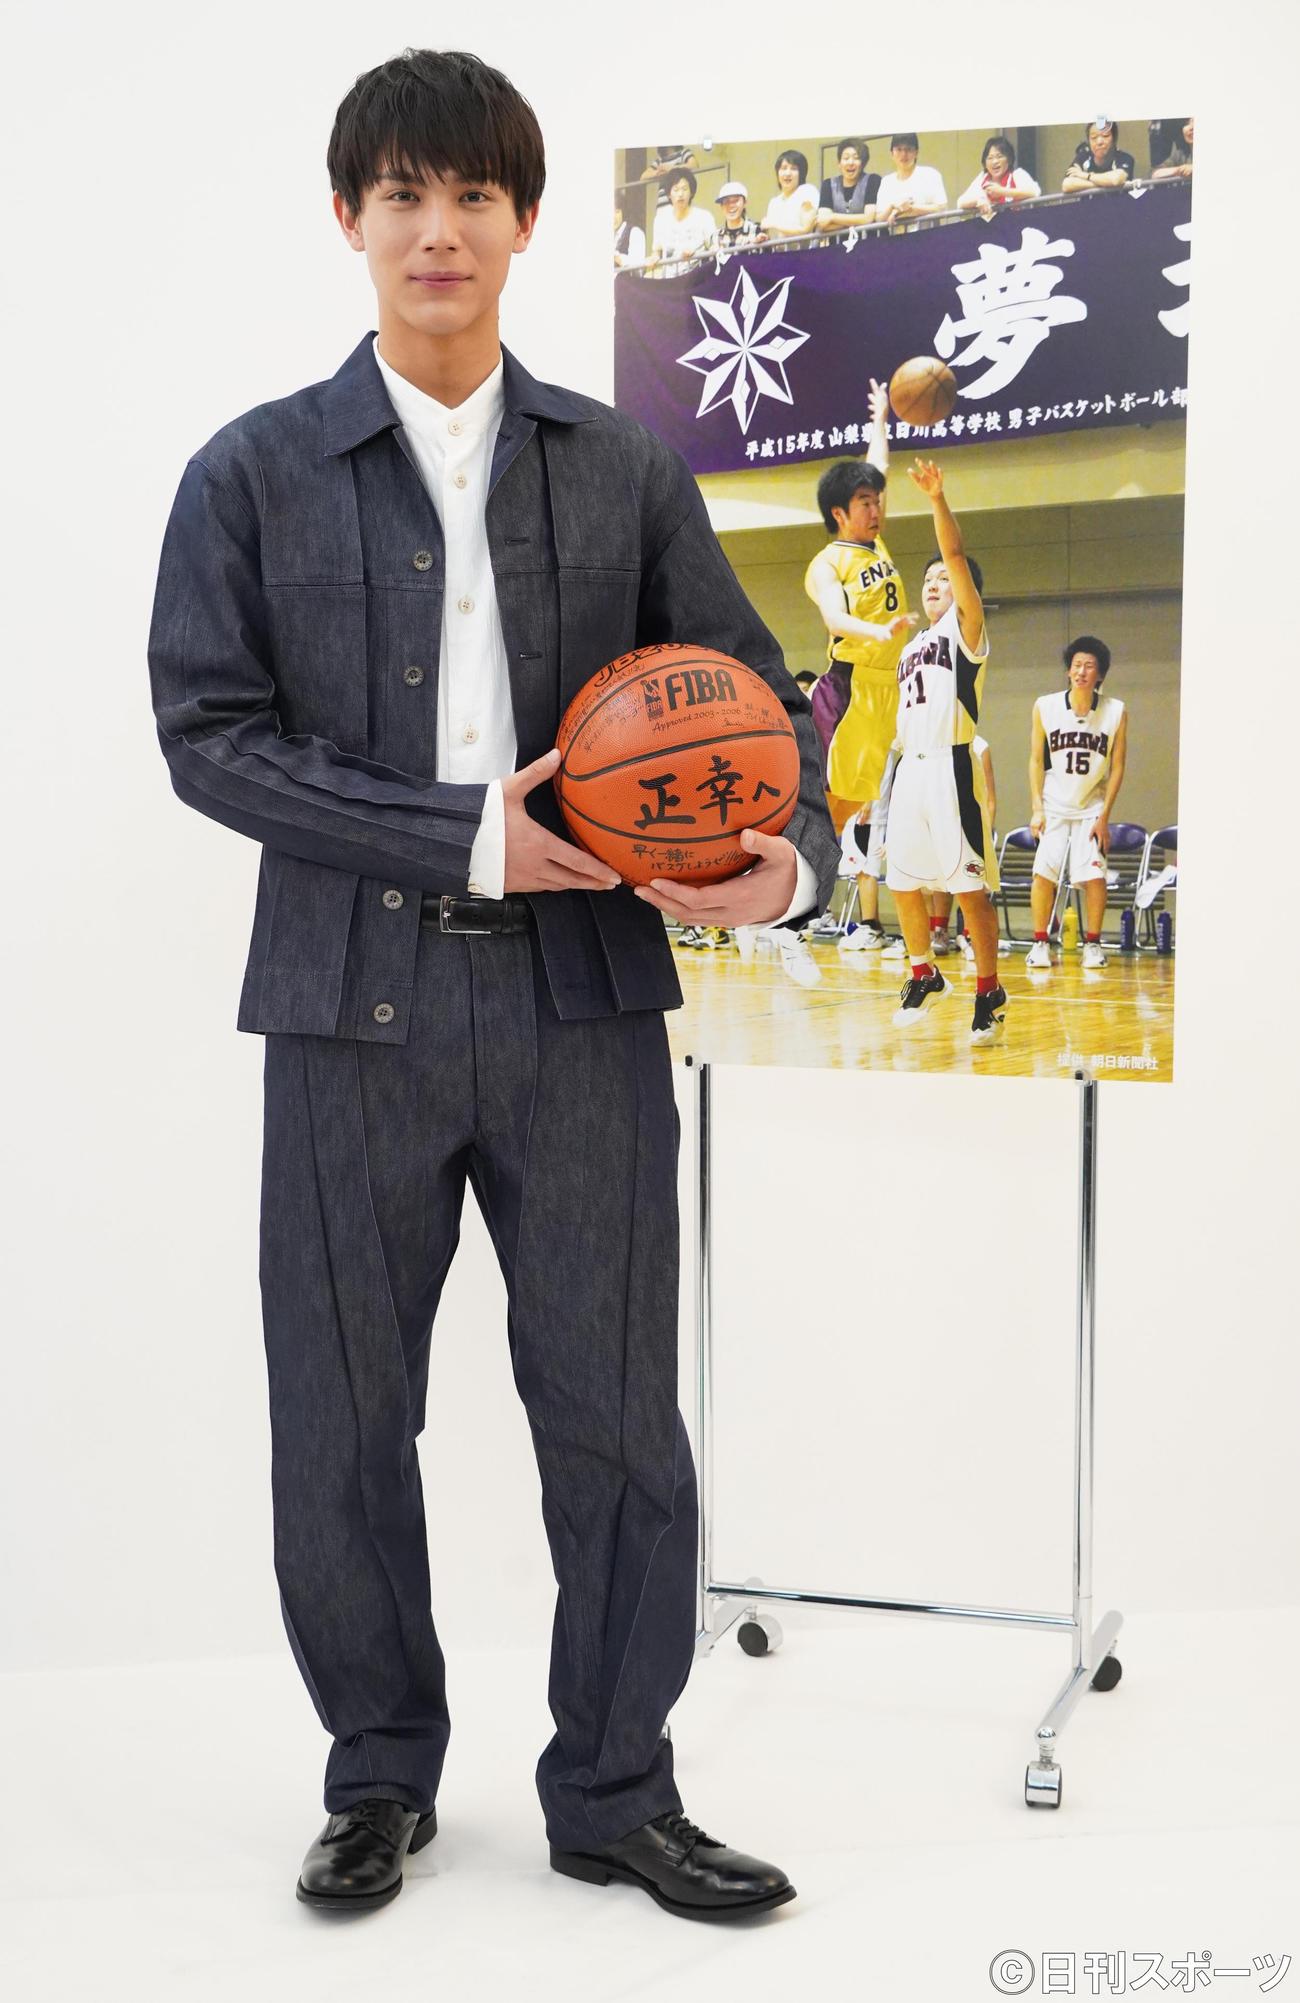 BS-TBS開局20周年記念ドラマ「左手一本のシュート」記者発表会見に出席した中川大志(撮影・佐藤成)